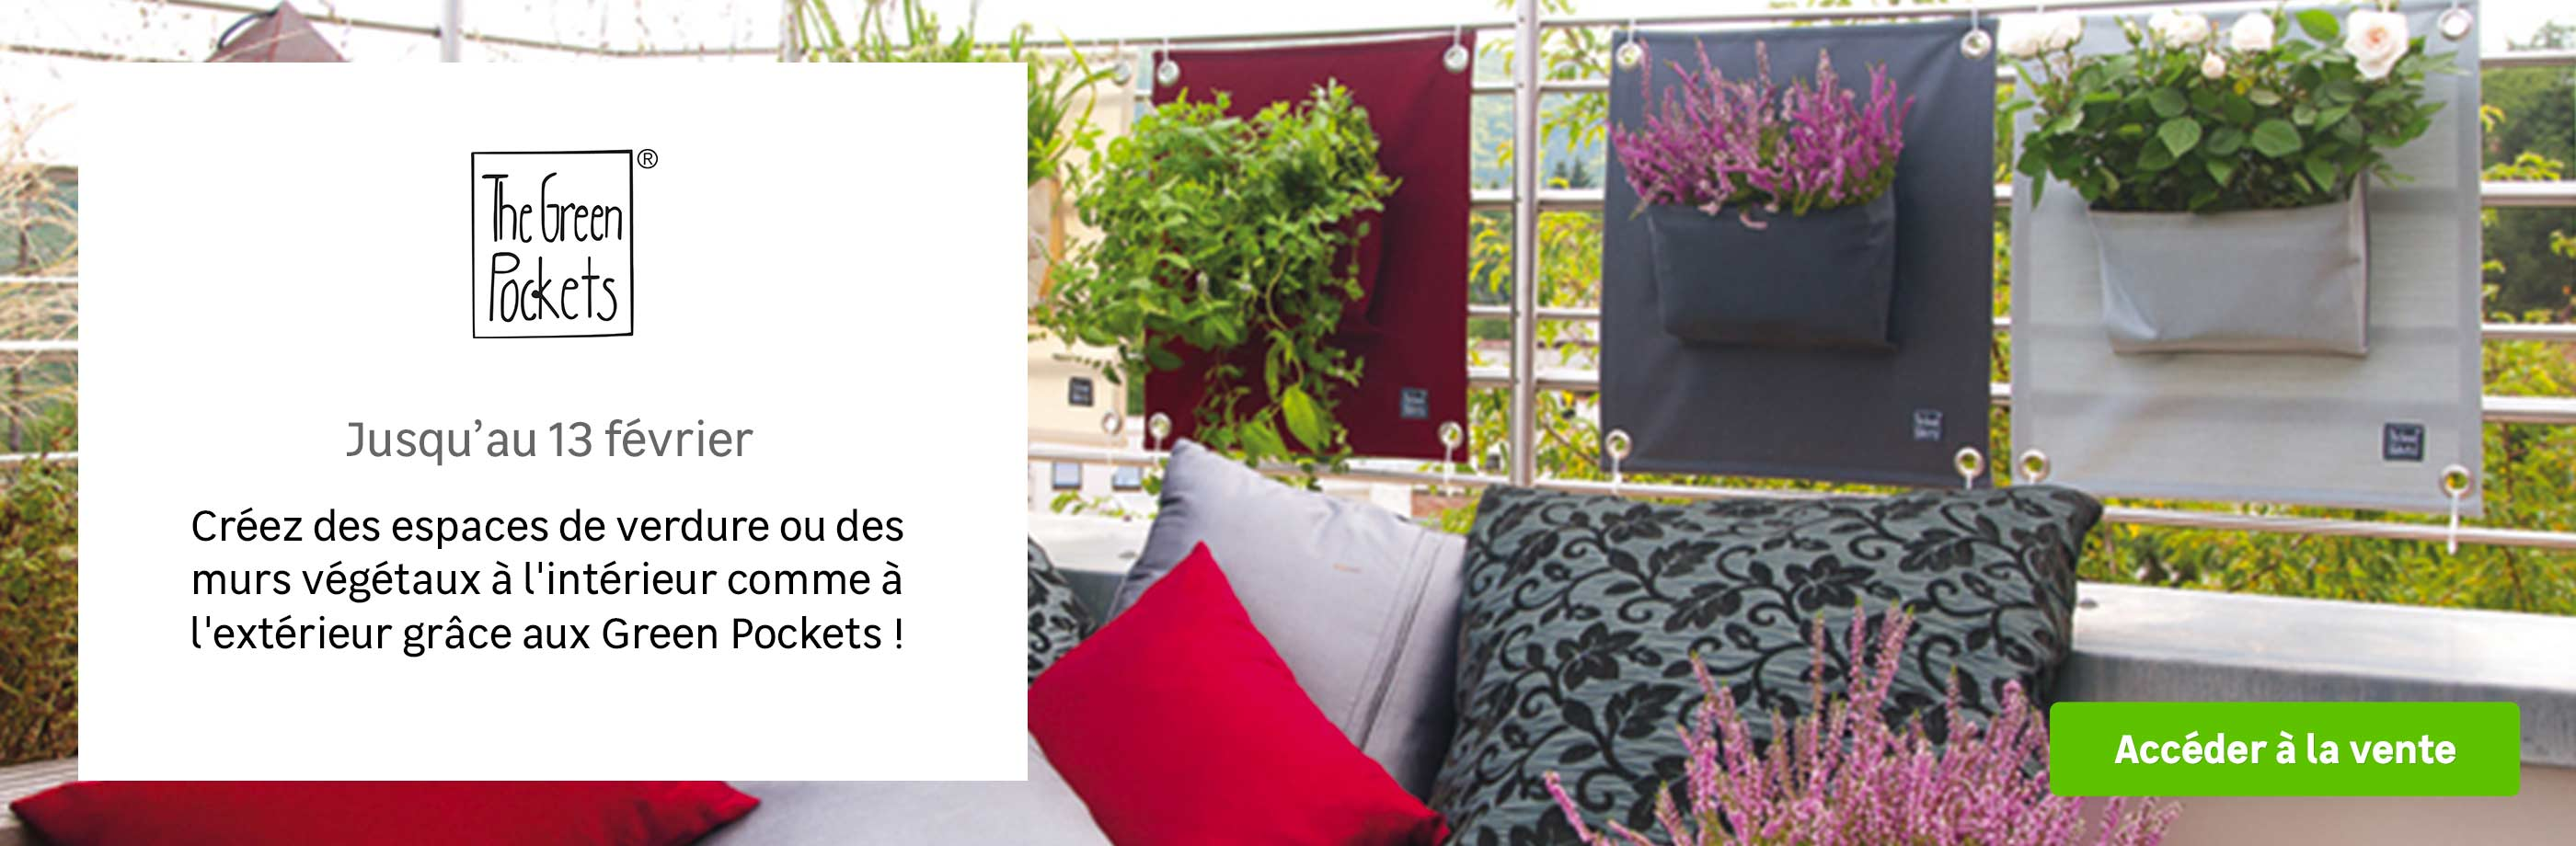 Ventes Privées Bricolage, Outillage, Jardin, Déco | Leroy Merlin